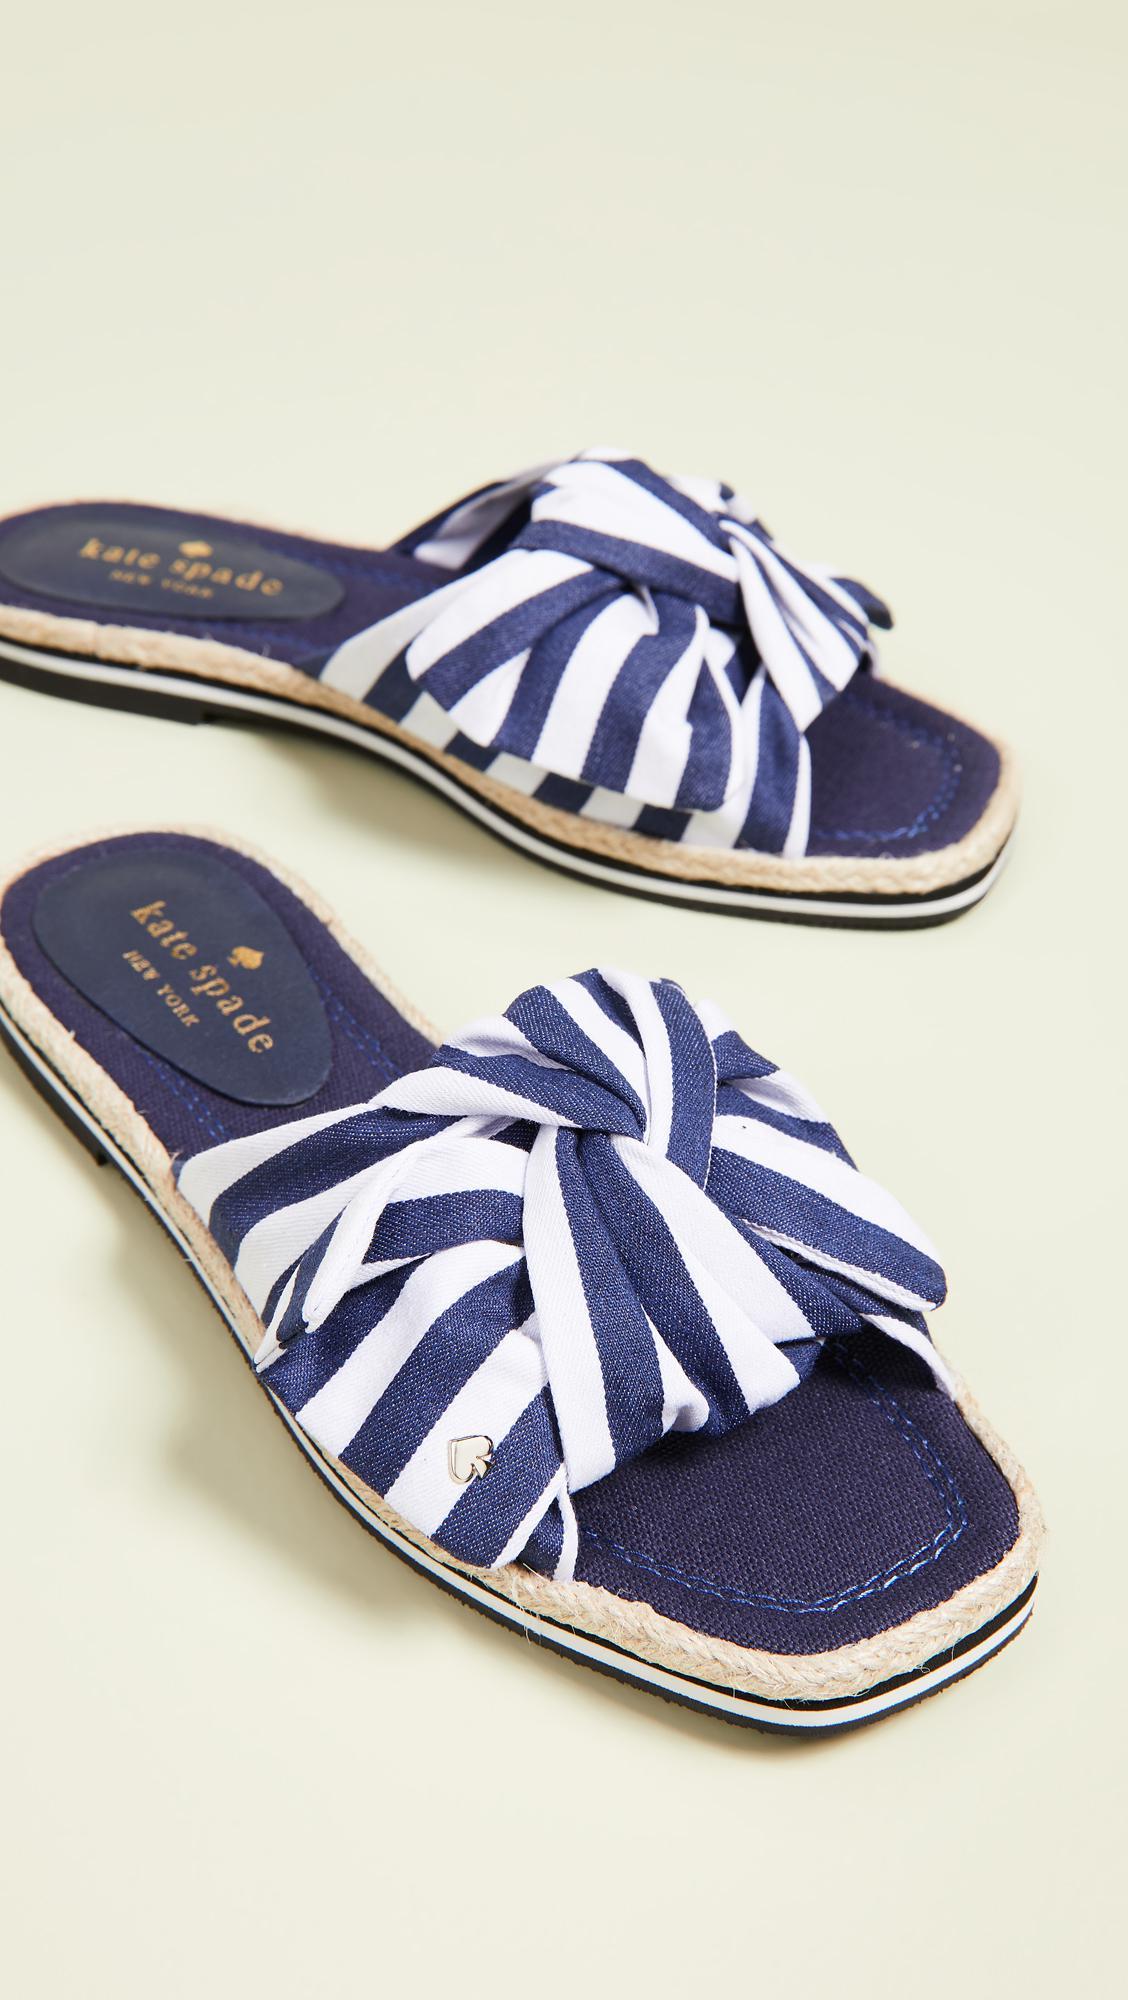 a253c3652742 Kate Spade Caliana Striped Slides in Blue - Save 21% - Lyst